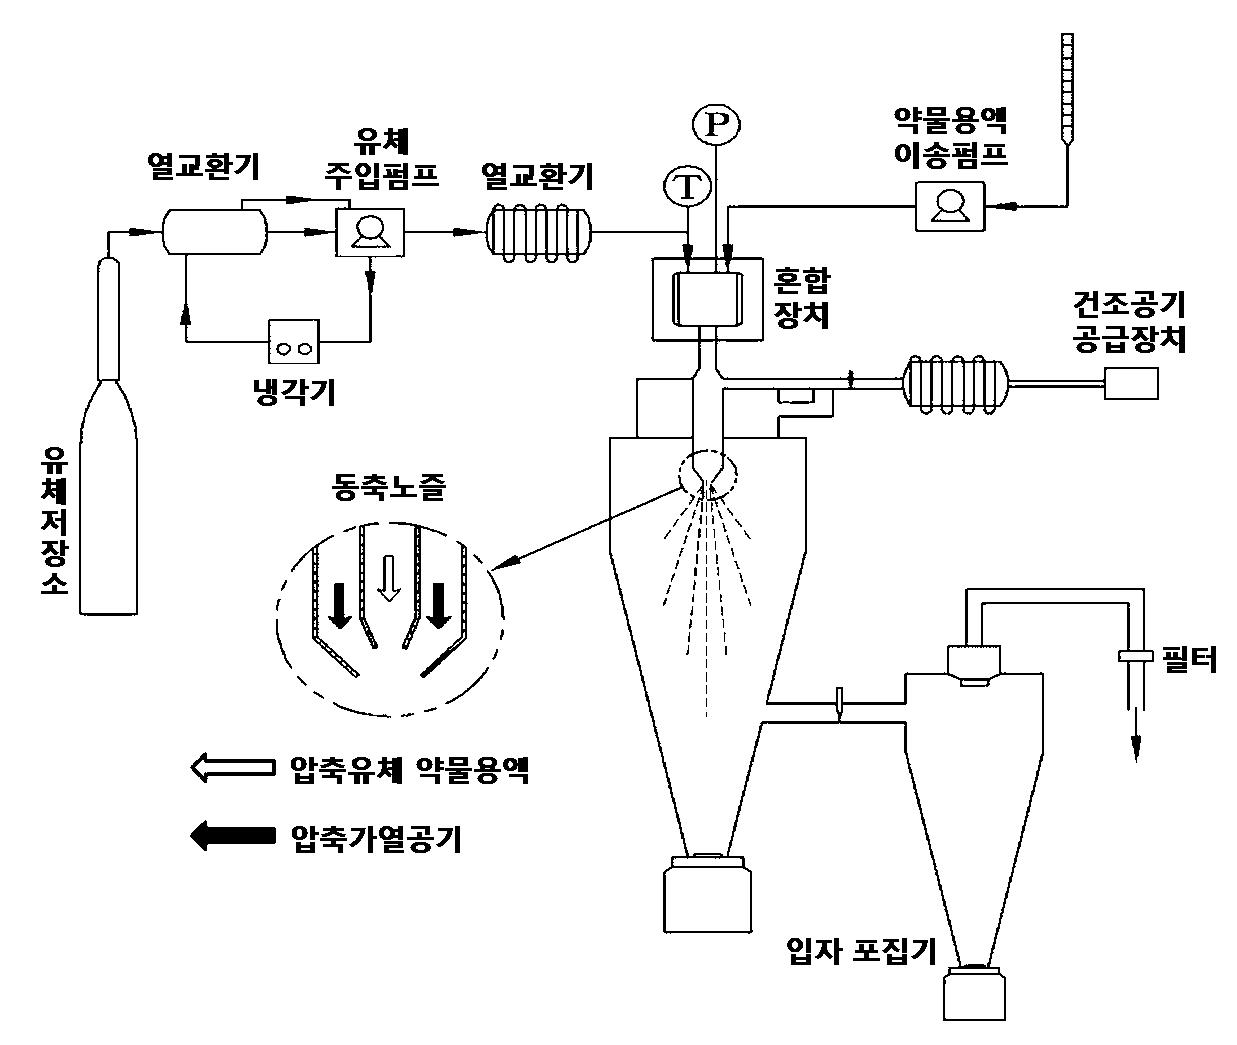 Patente Wo A1